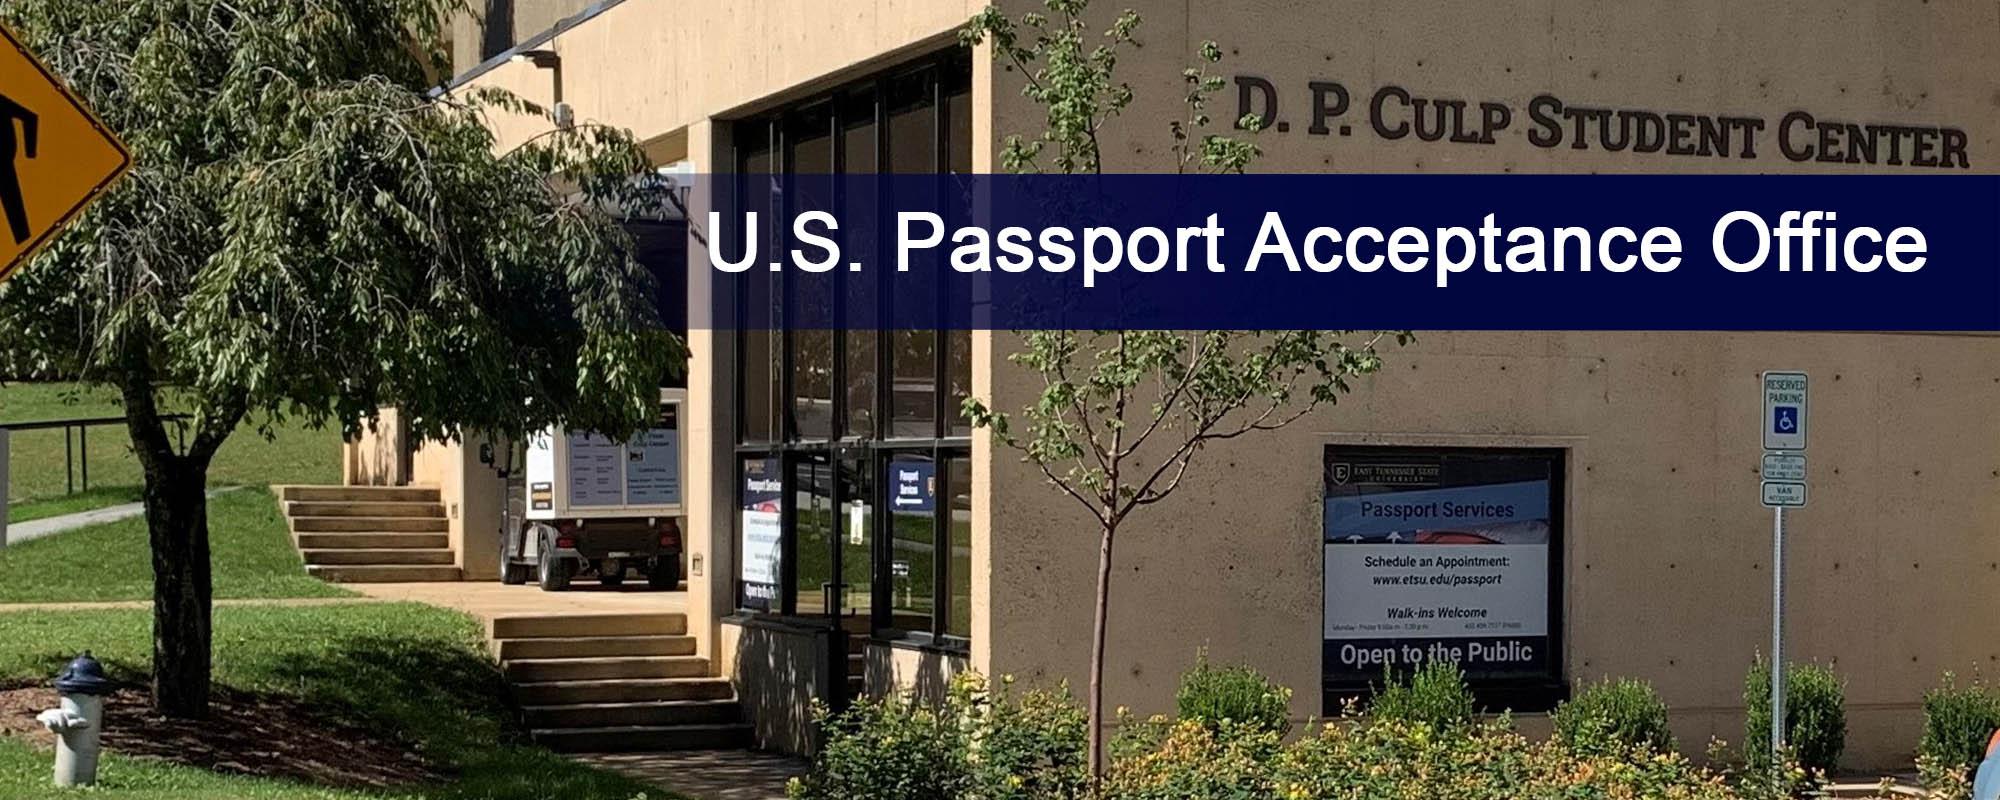 US Passport Acceptance Office